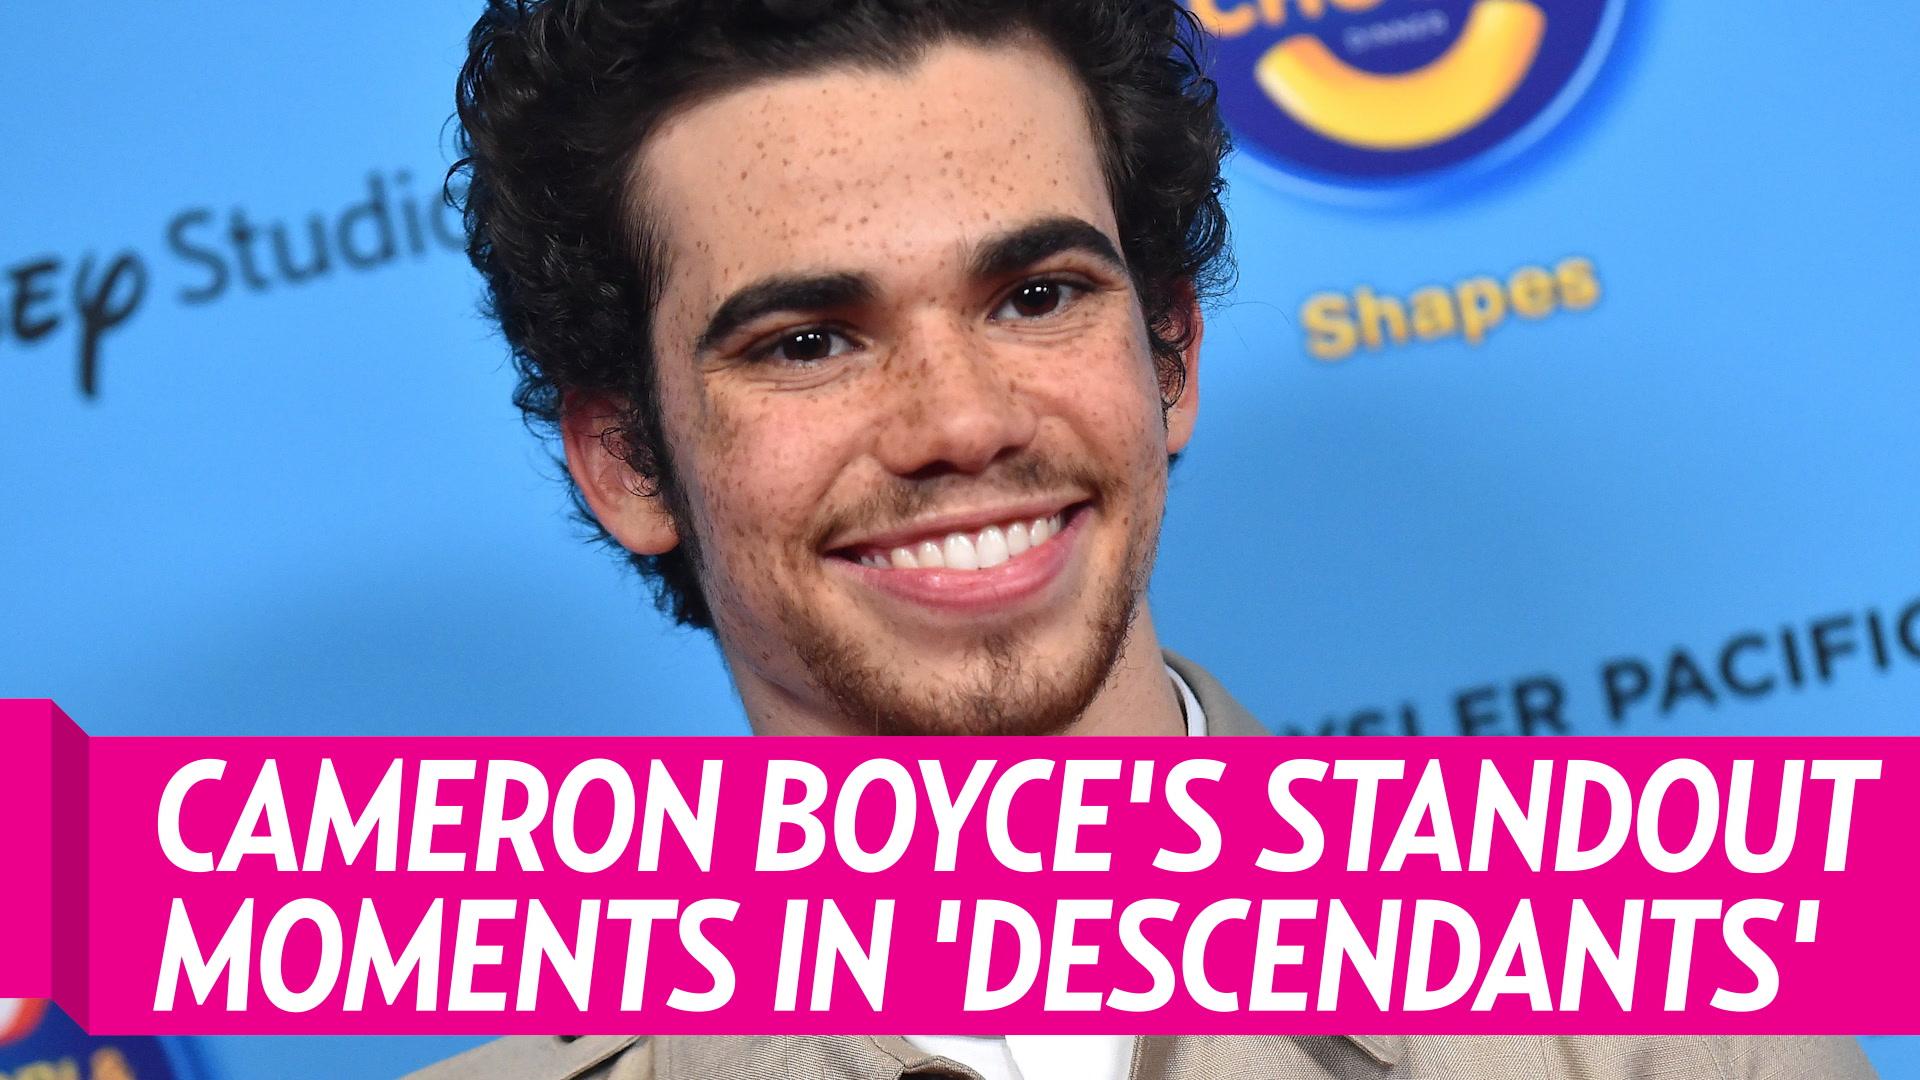 Cameron Boyce's Standout Moments In 'Descendants'